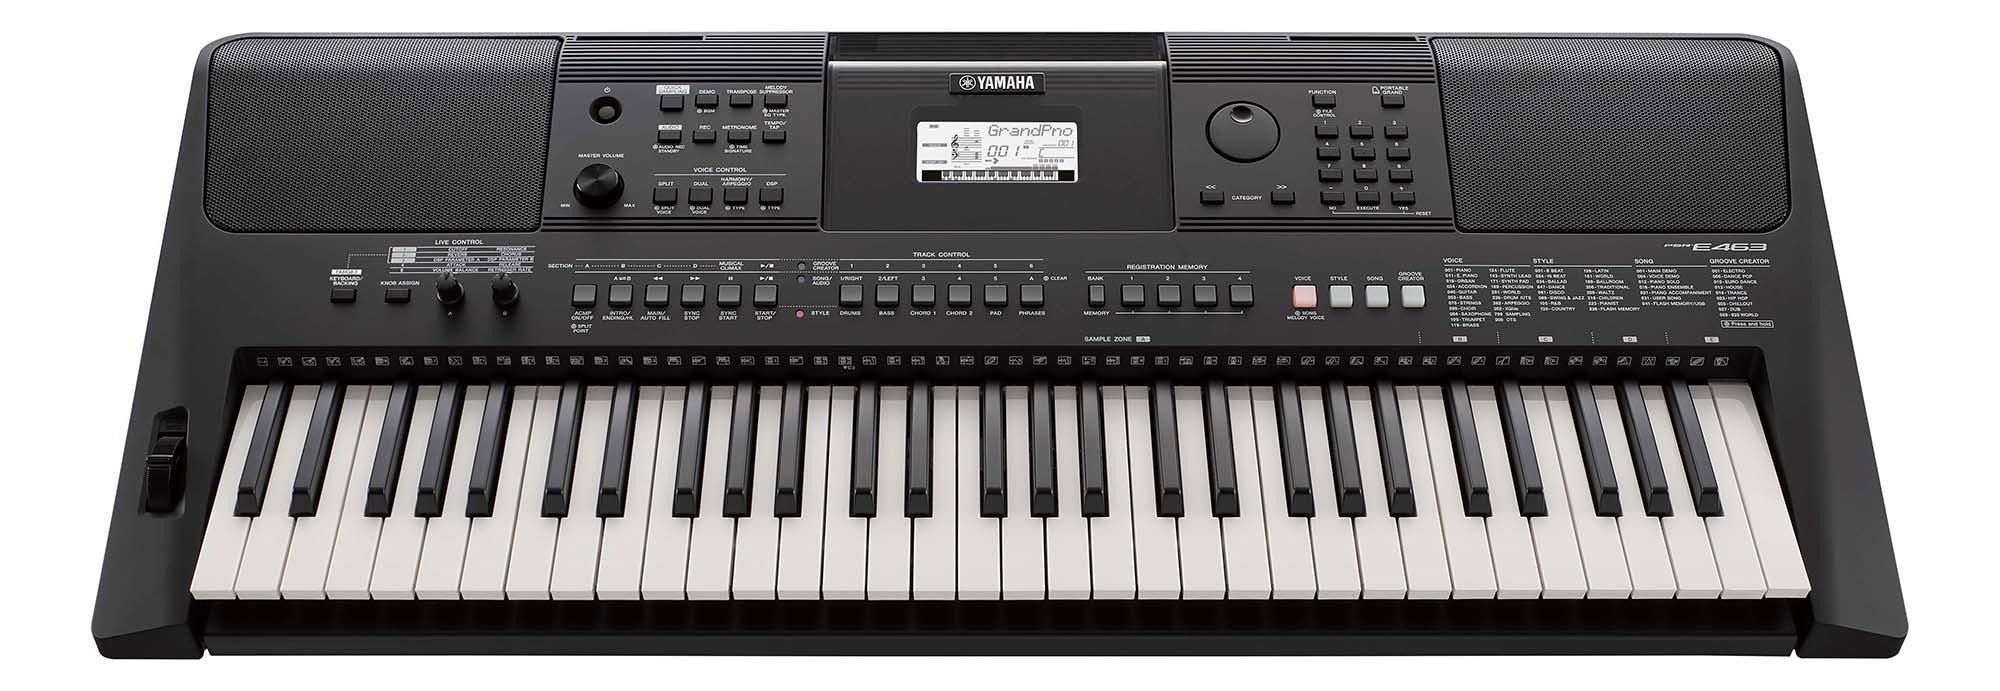 Yamaha PSRE463 61-Key Keyboard